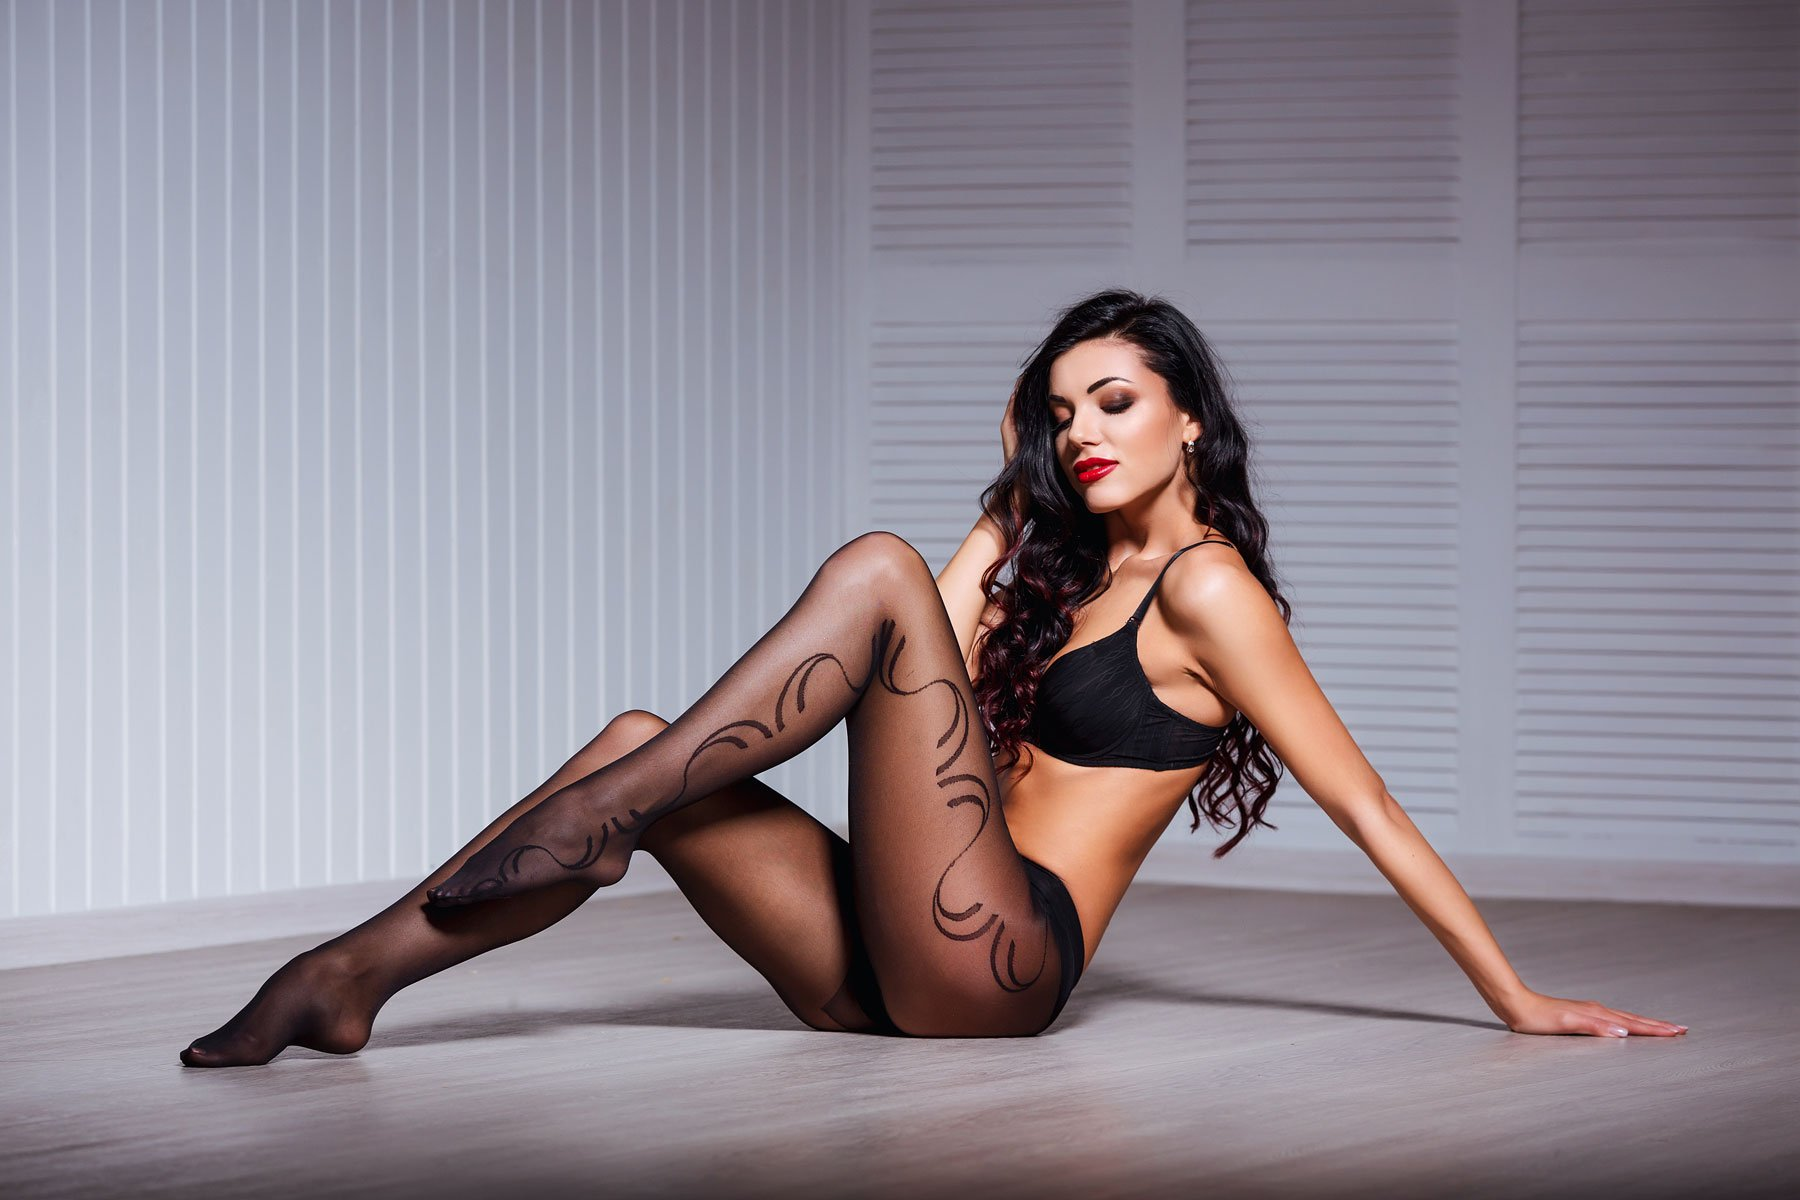 Modella in lingerie con calze ricamate